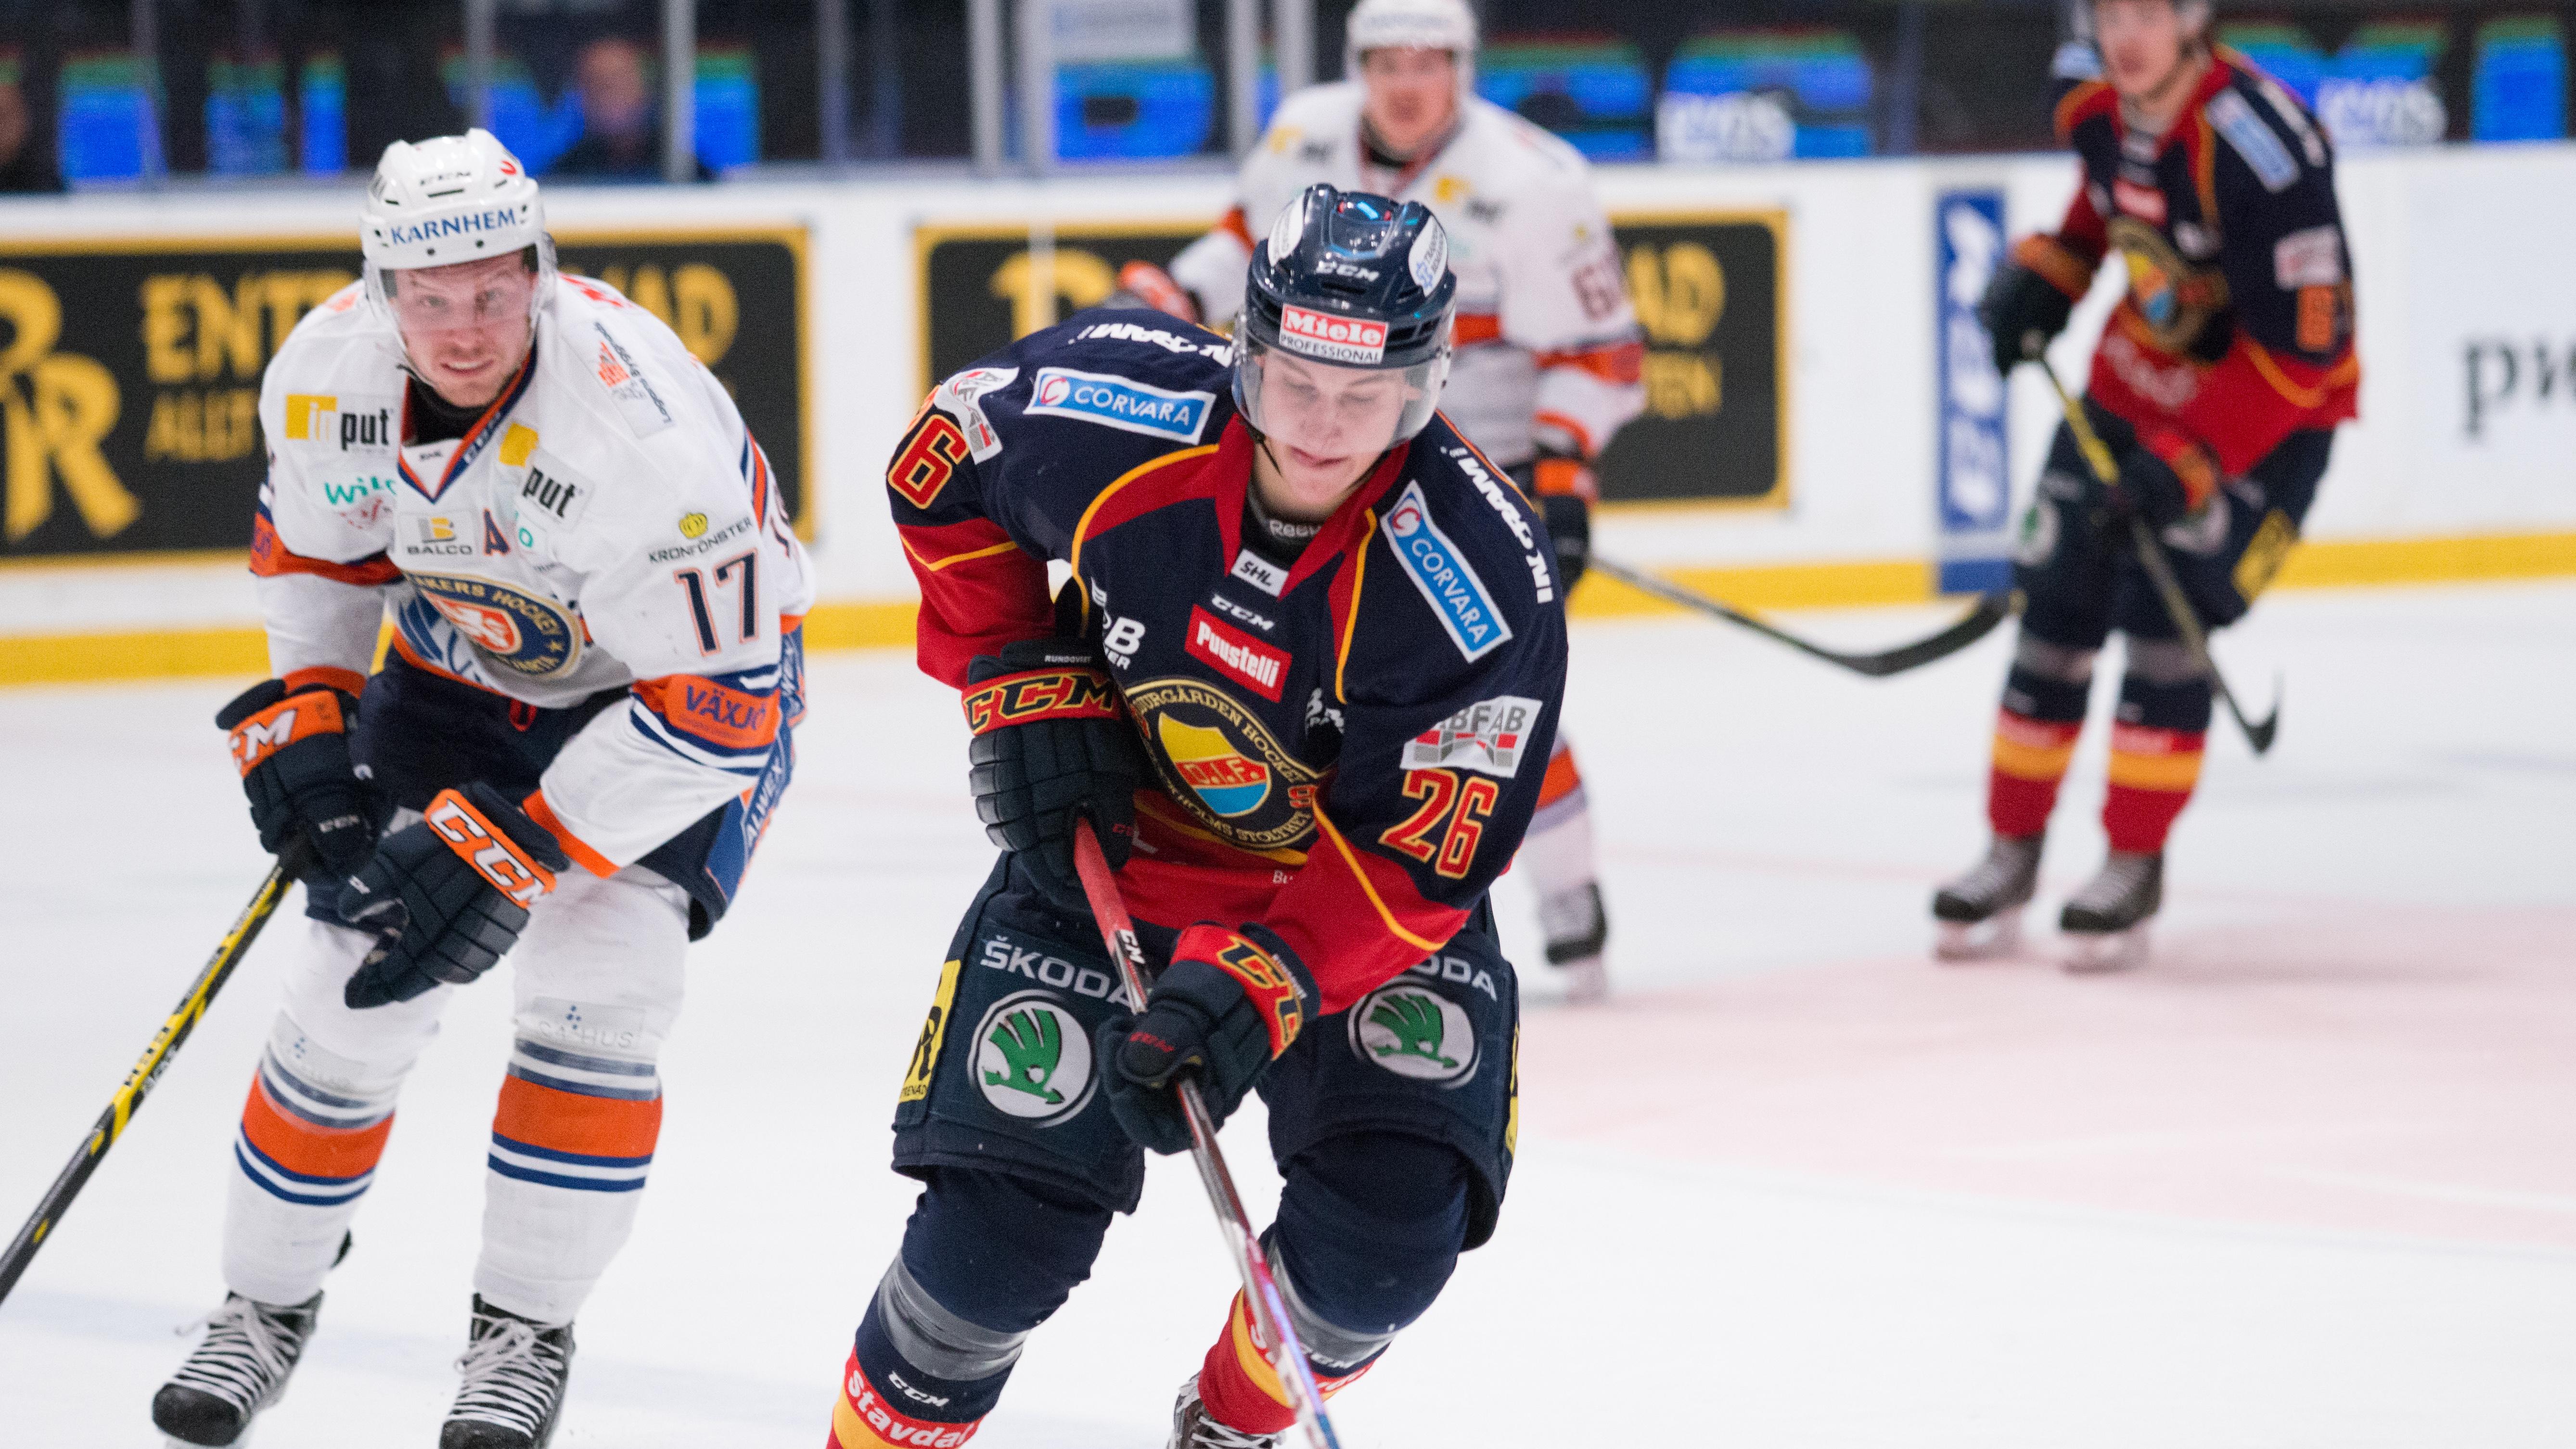 David Rundqvist